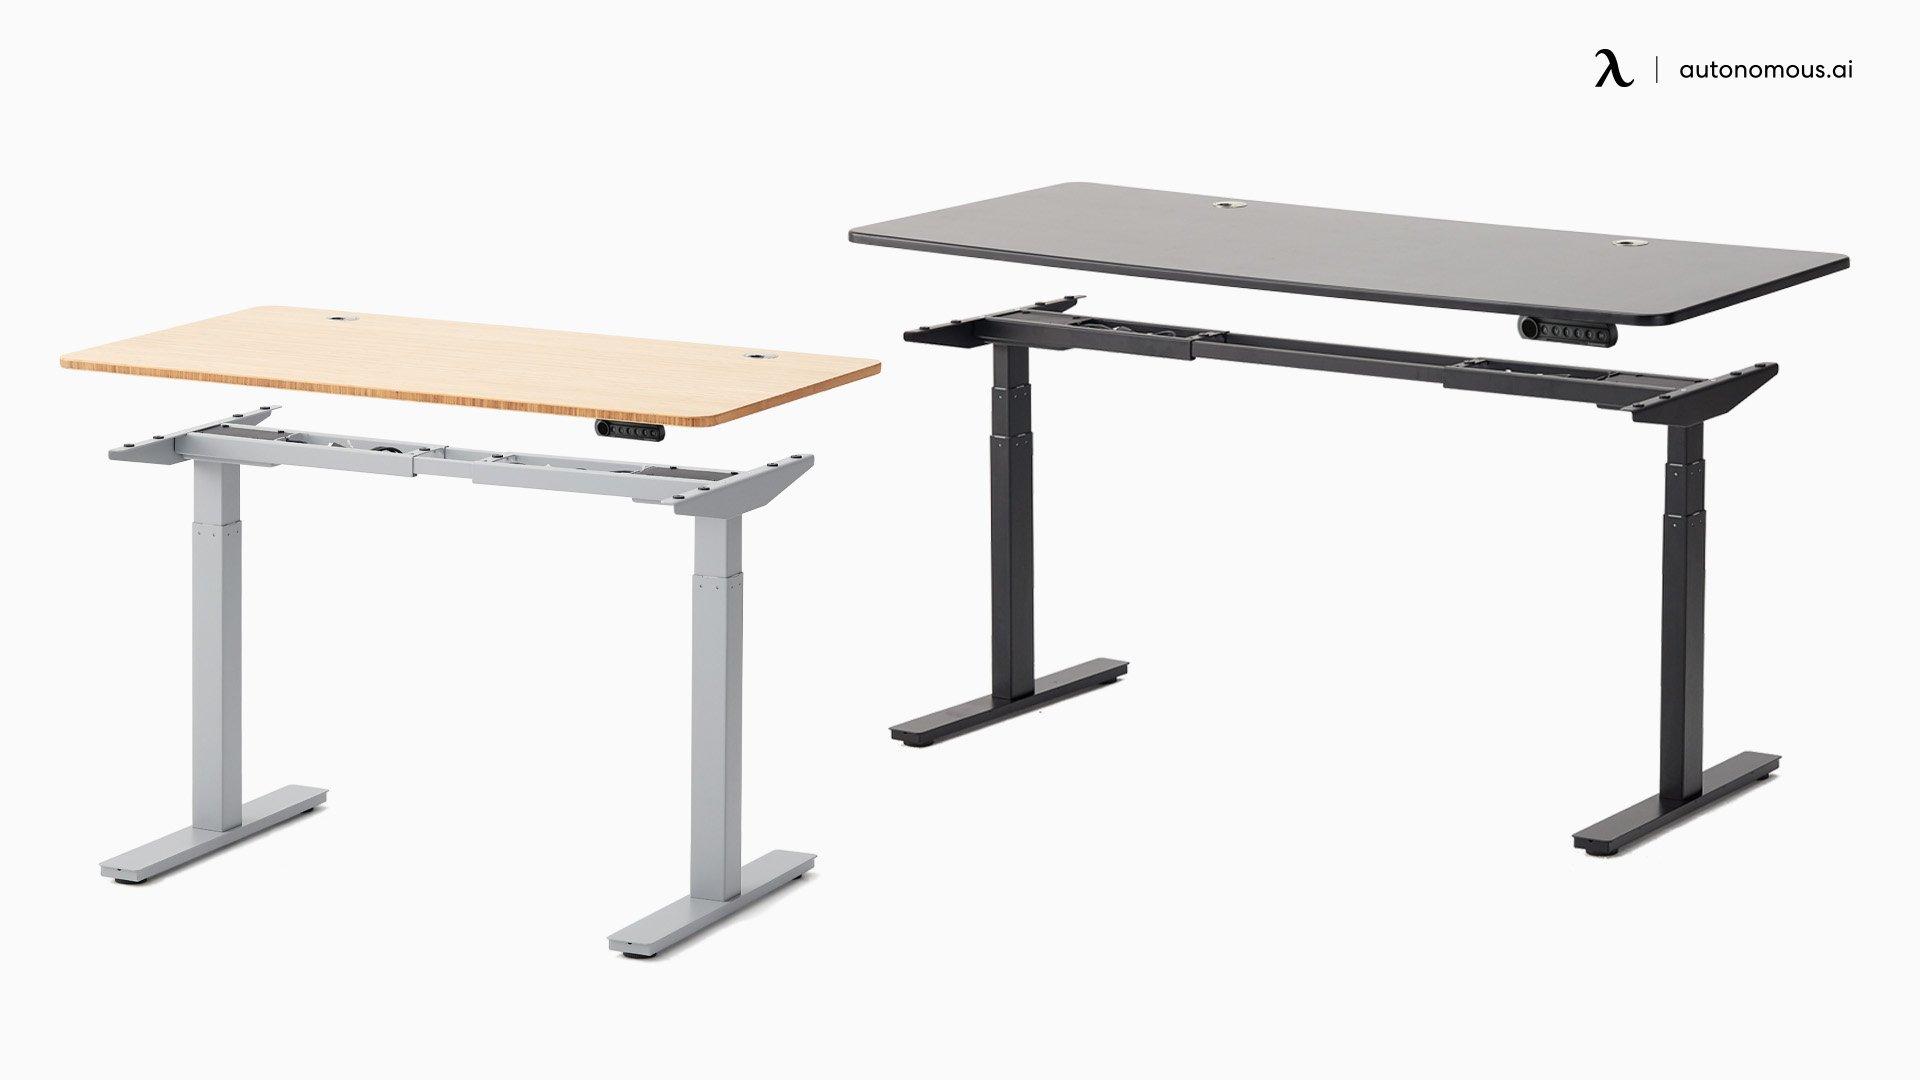 Warm Wood Desk Setup